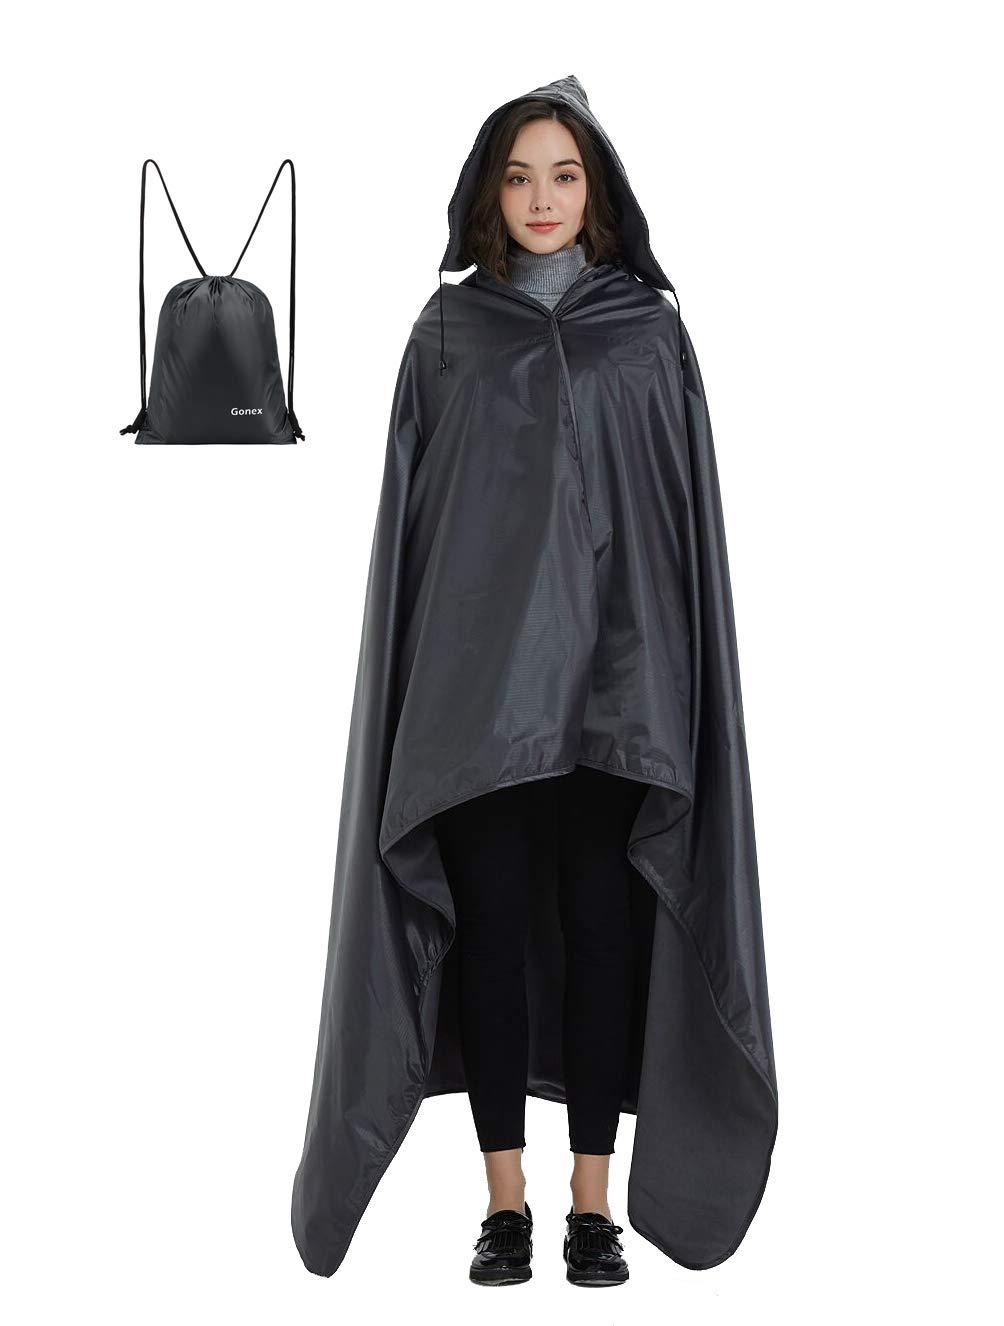 Gonex Waterproof Windproof Drawstring Backpack